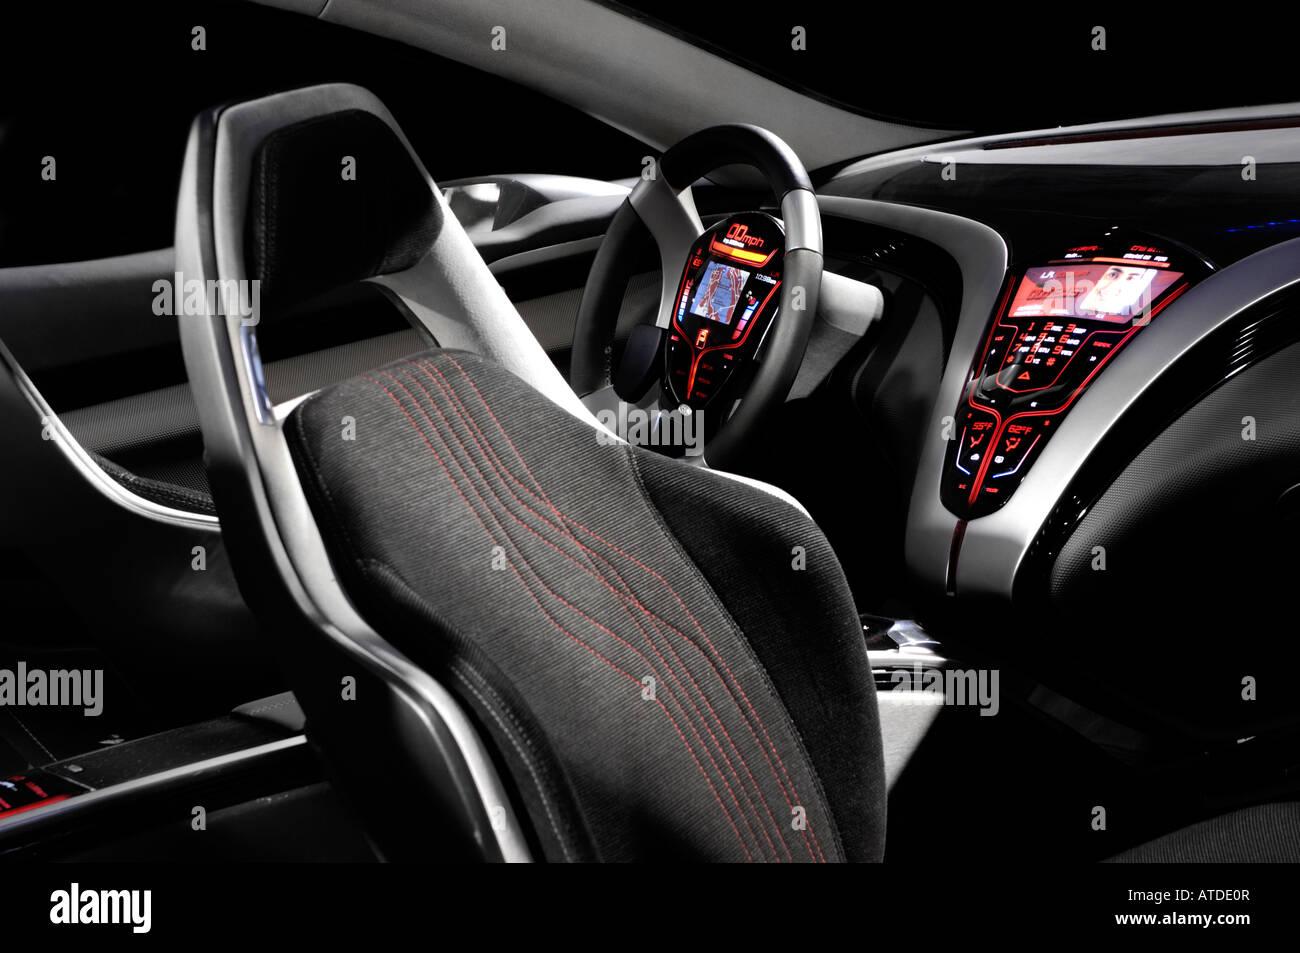 Kue Futuristic Concept Car Interior Stock Photo 16283686 Alamy